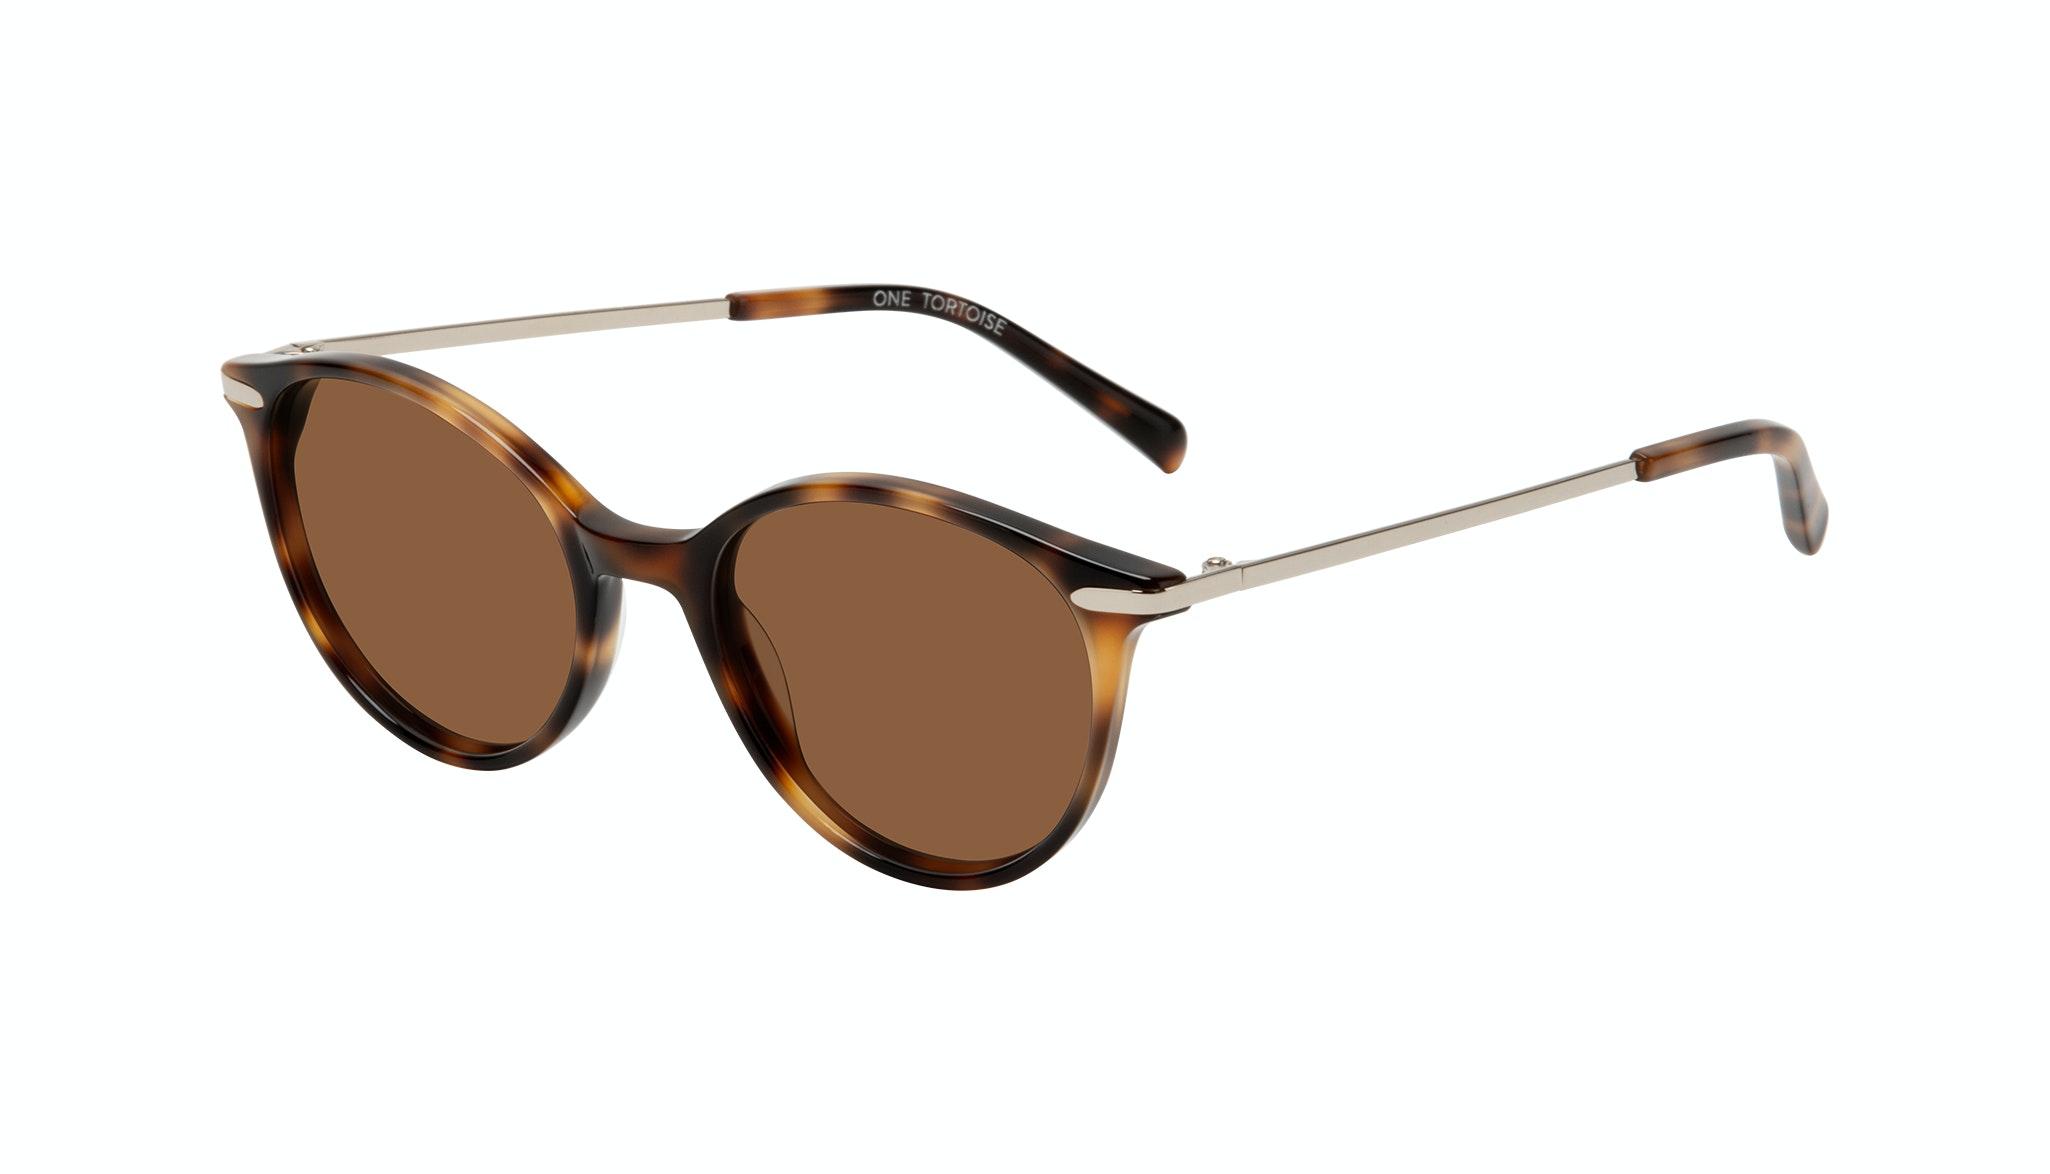 Affordable Fashion Glasses Round Sunglasses Women One Tortoise Tilt